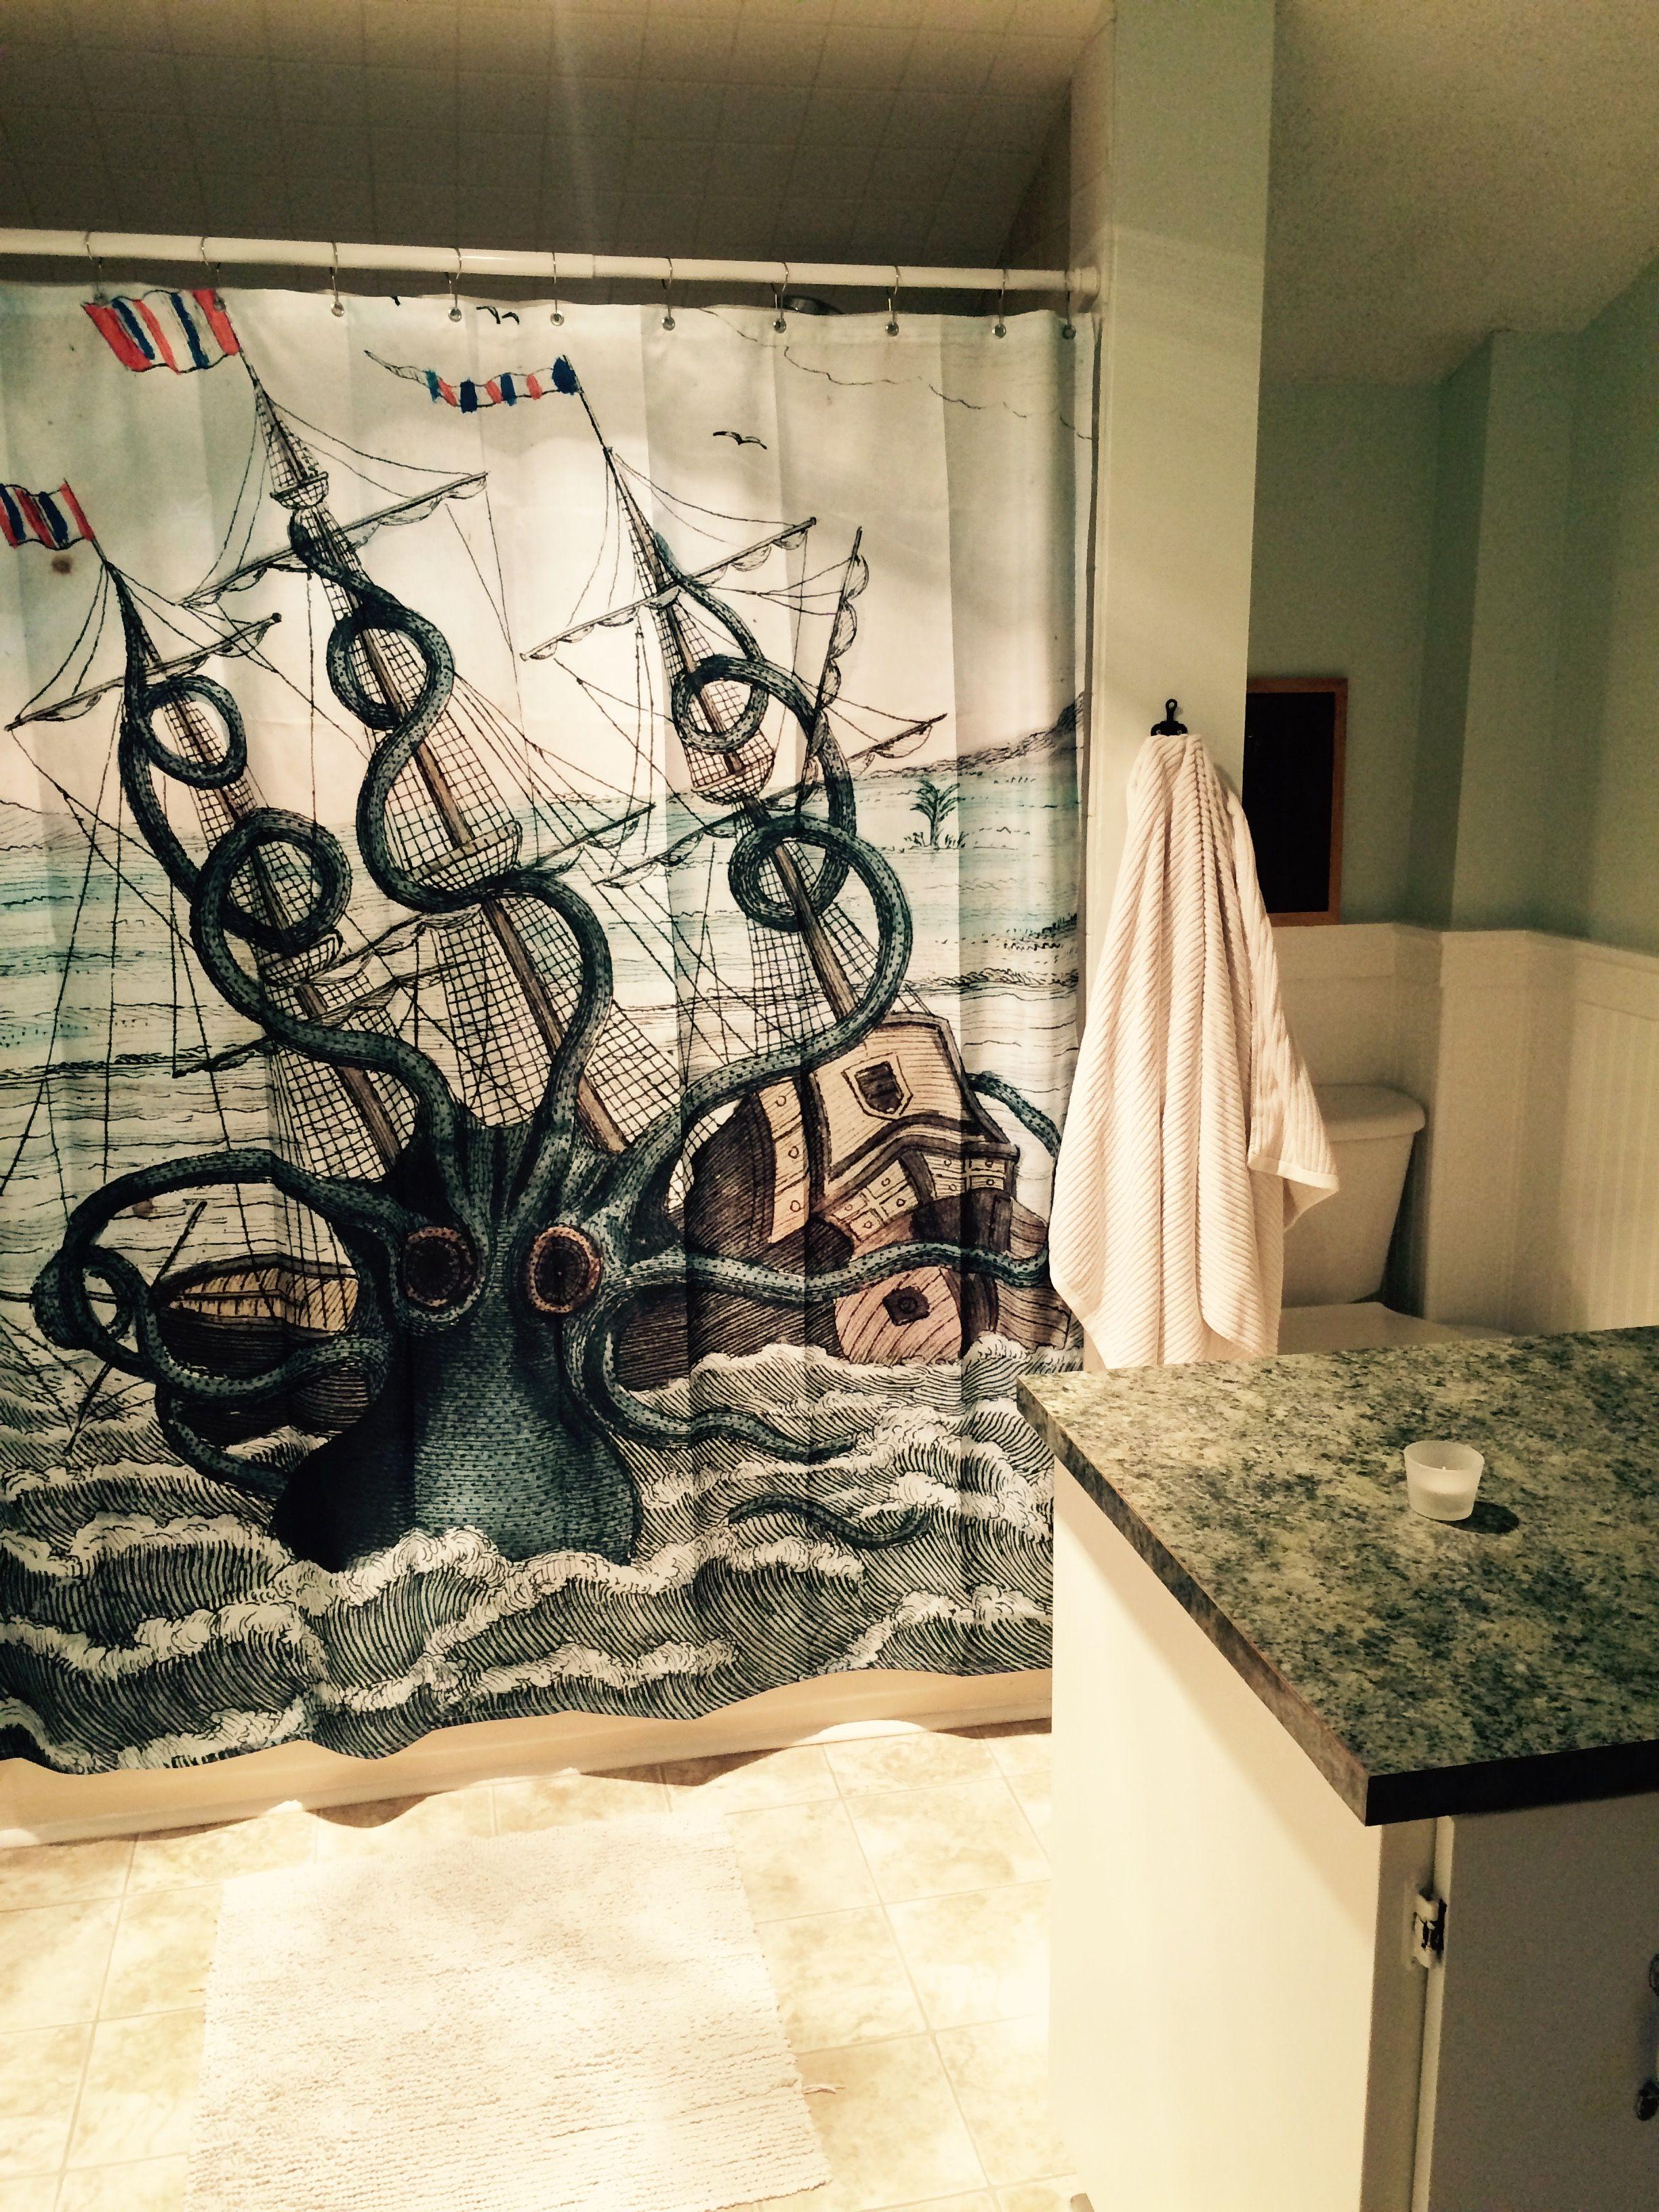 Kraken shower curtain and green walls in bathroom